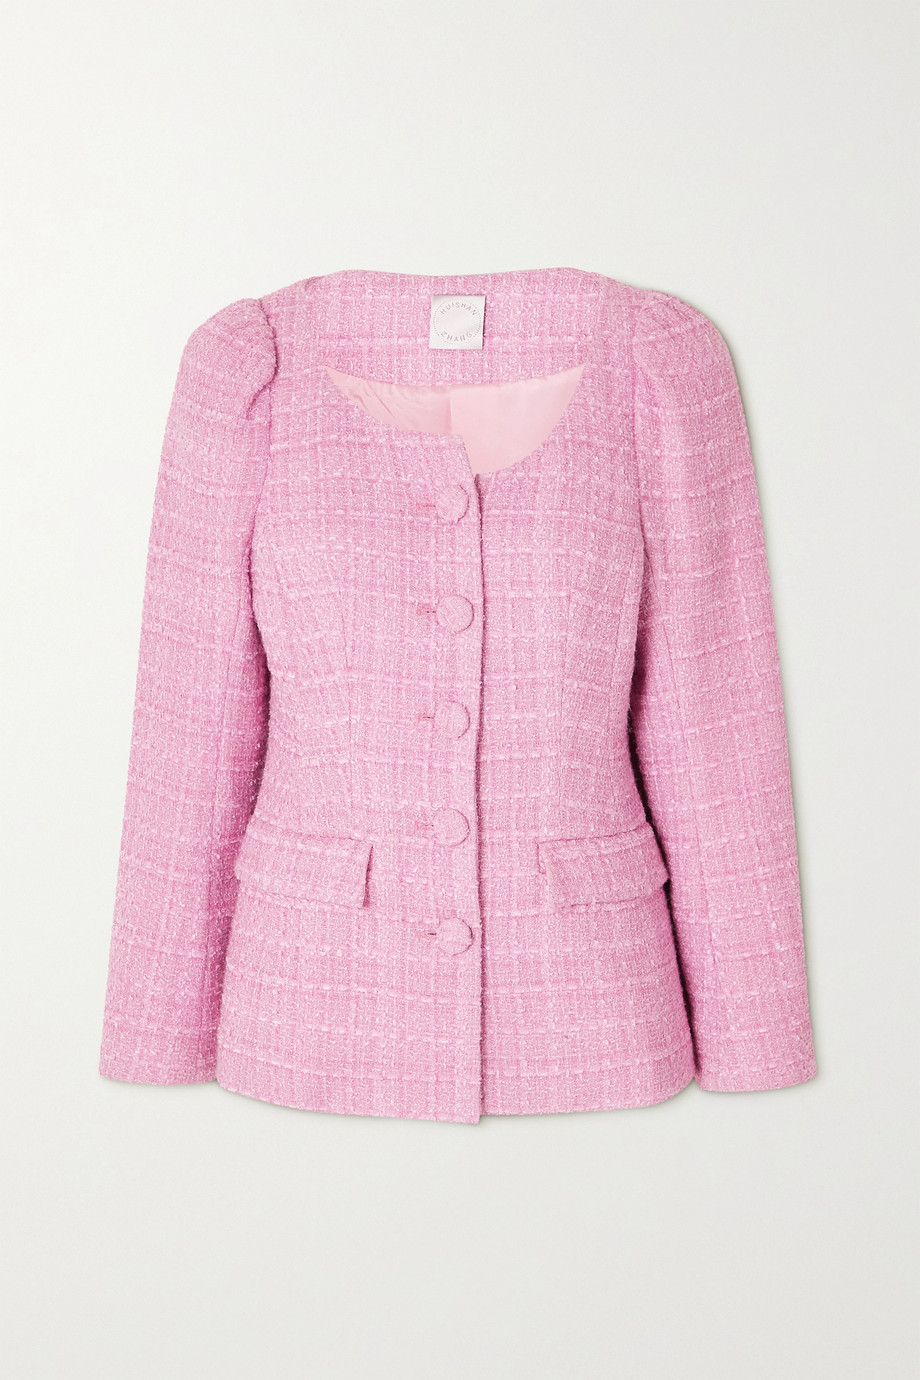 Huishan Zhang Catrina tweed jacket